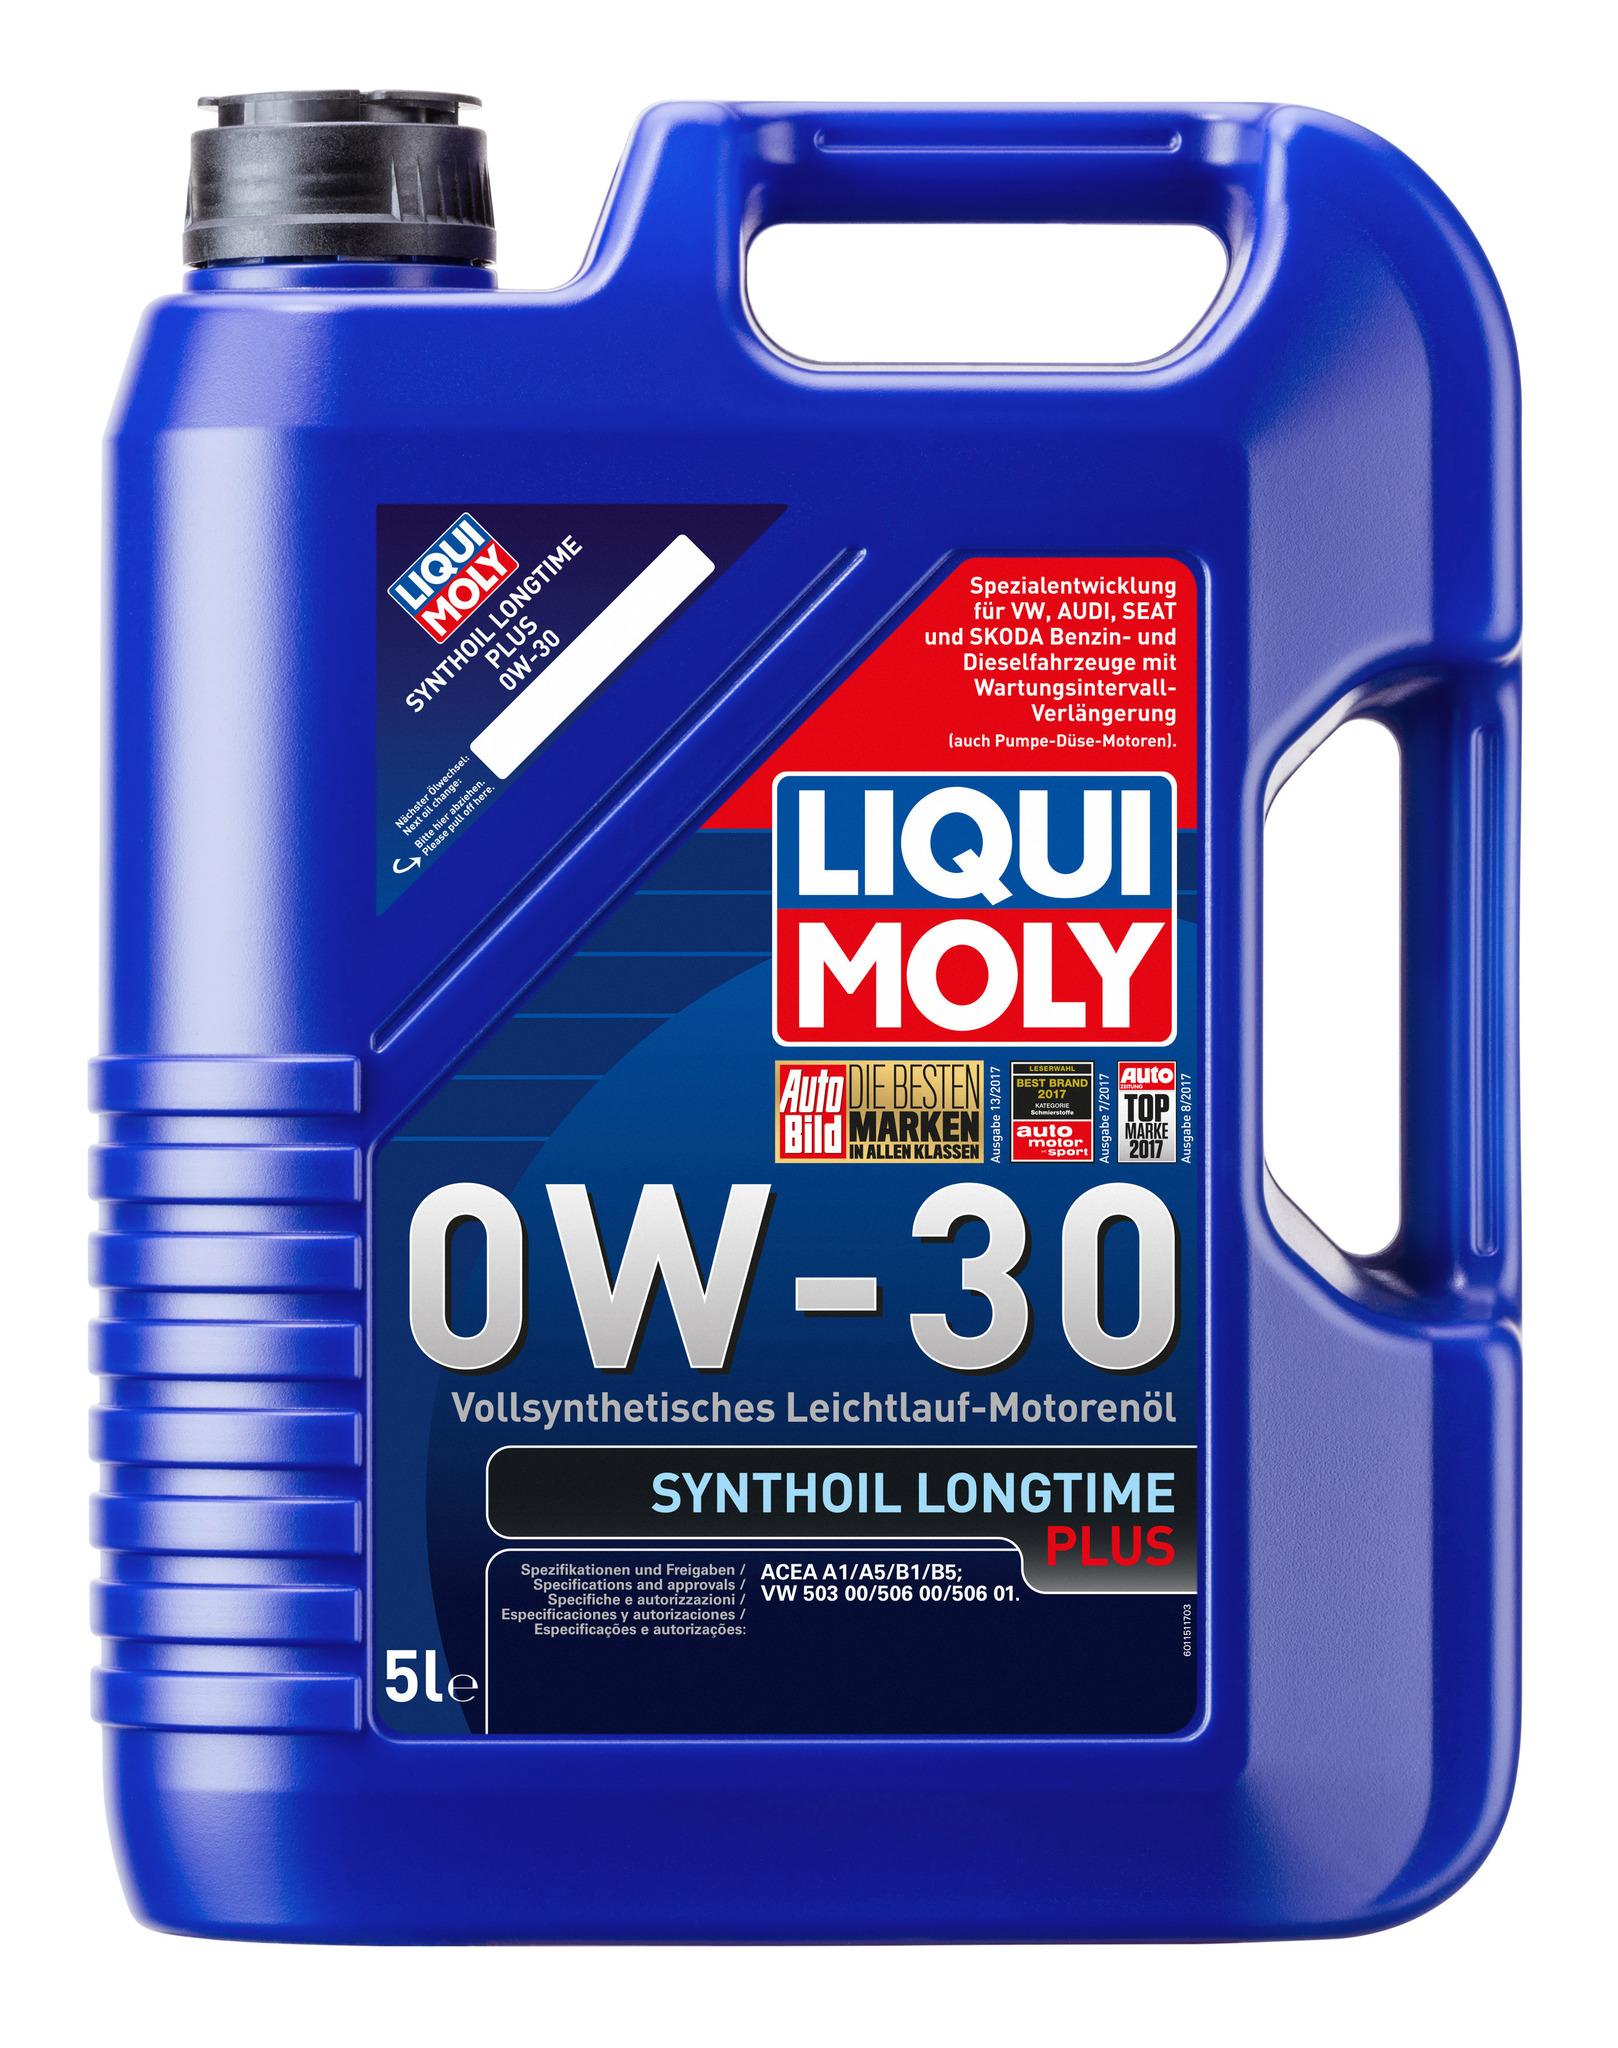 Liqui Moly Synthoil Longtime Plus 0W30 Синтетическое моторное масло (1151)